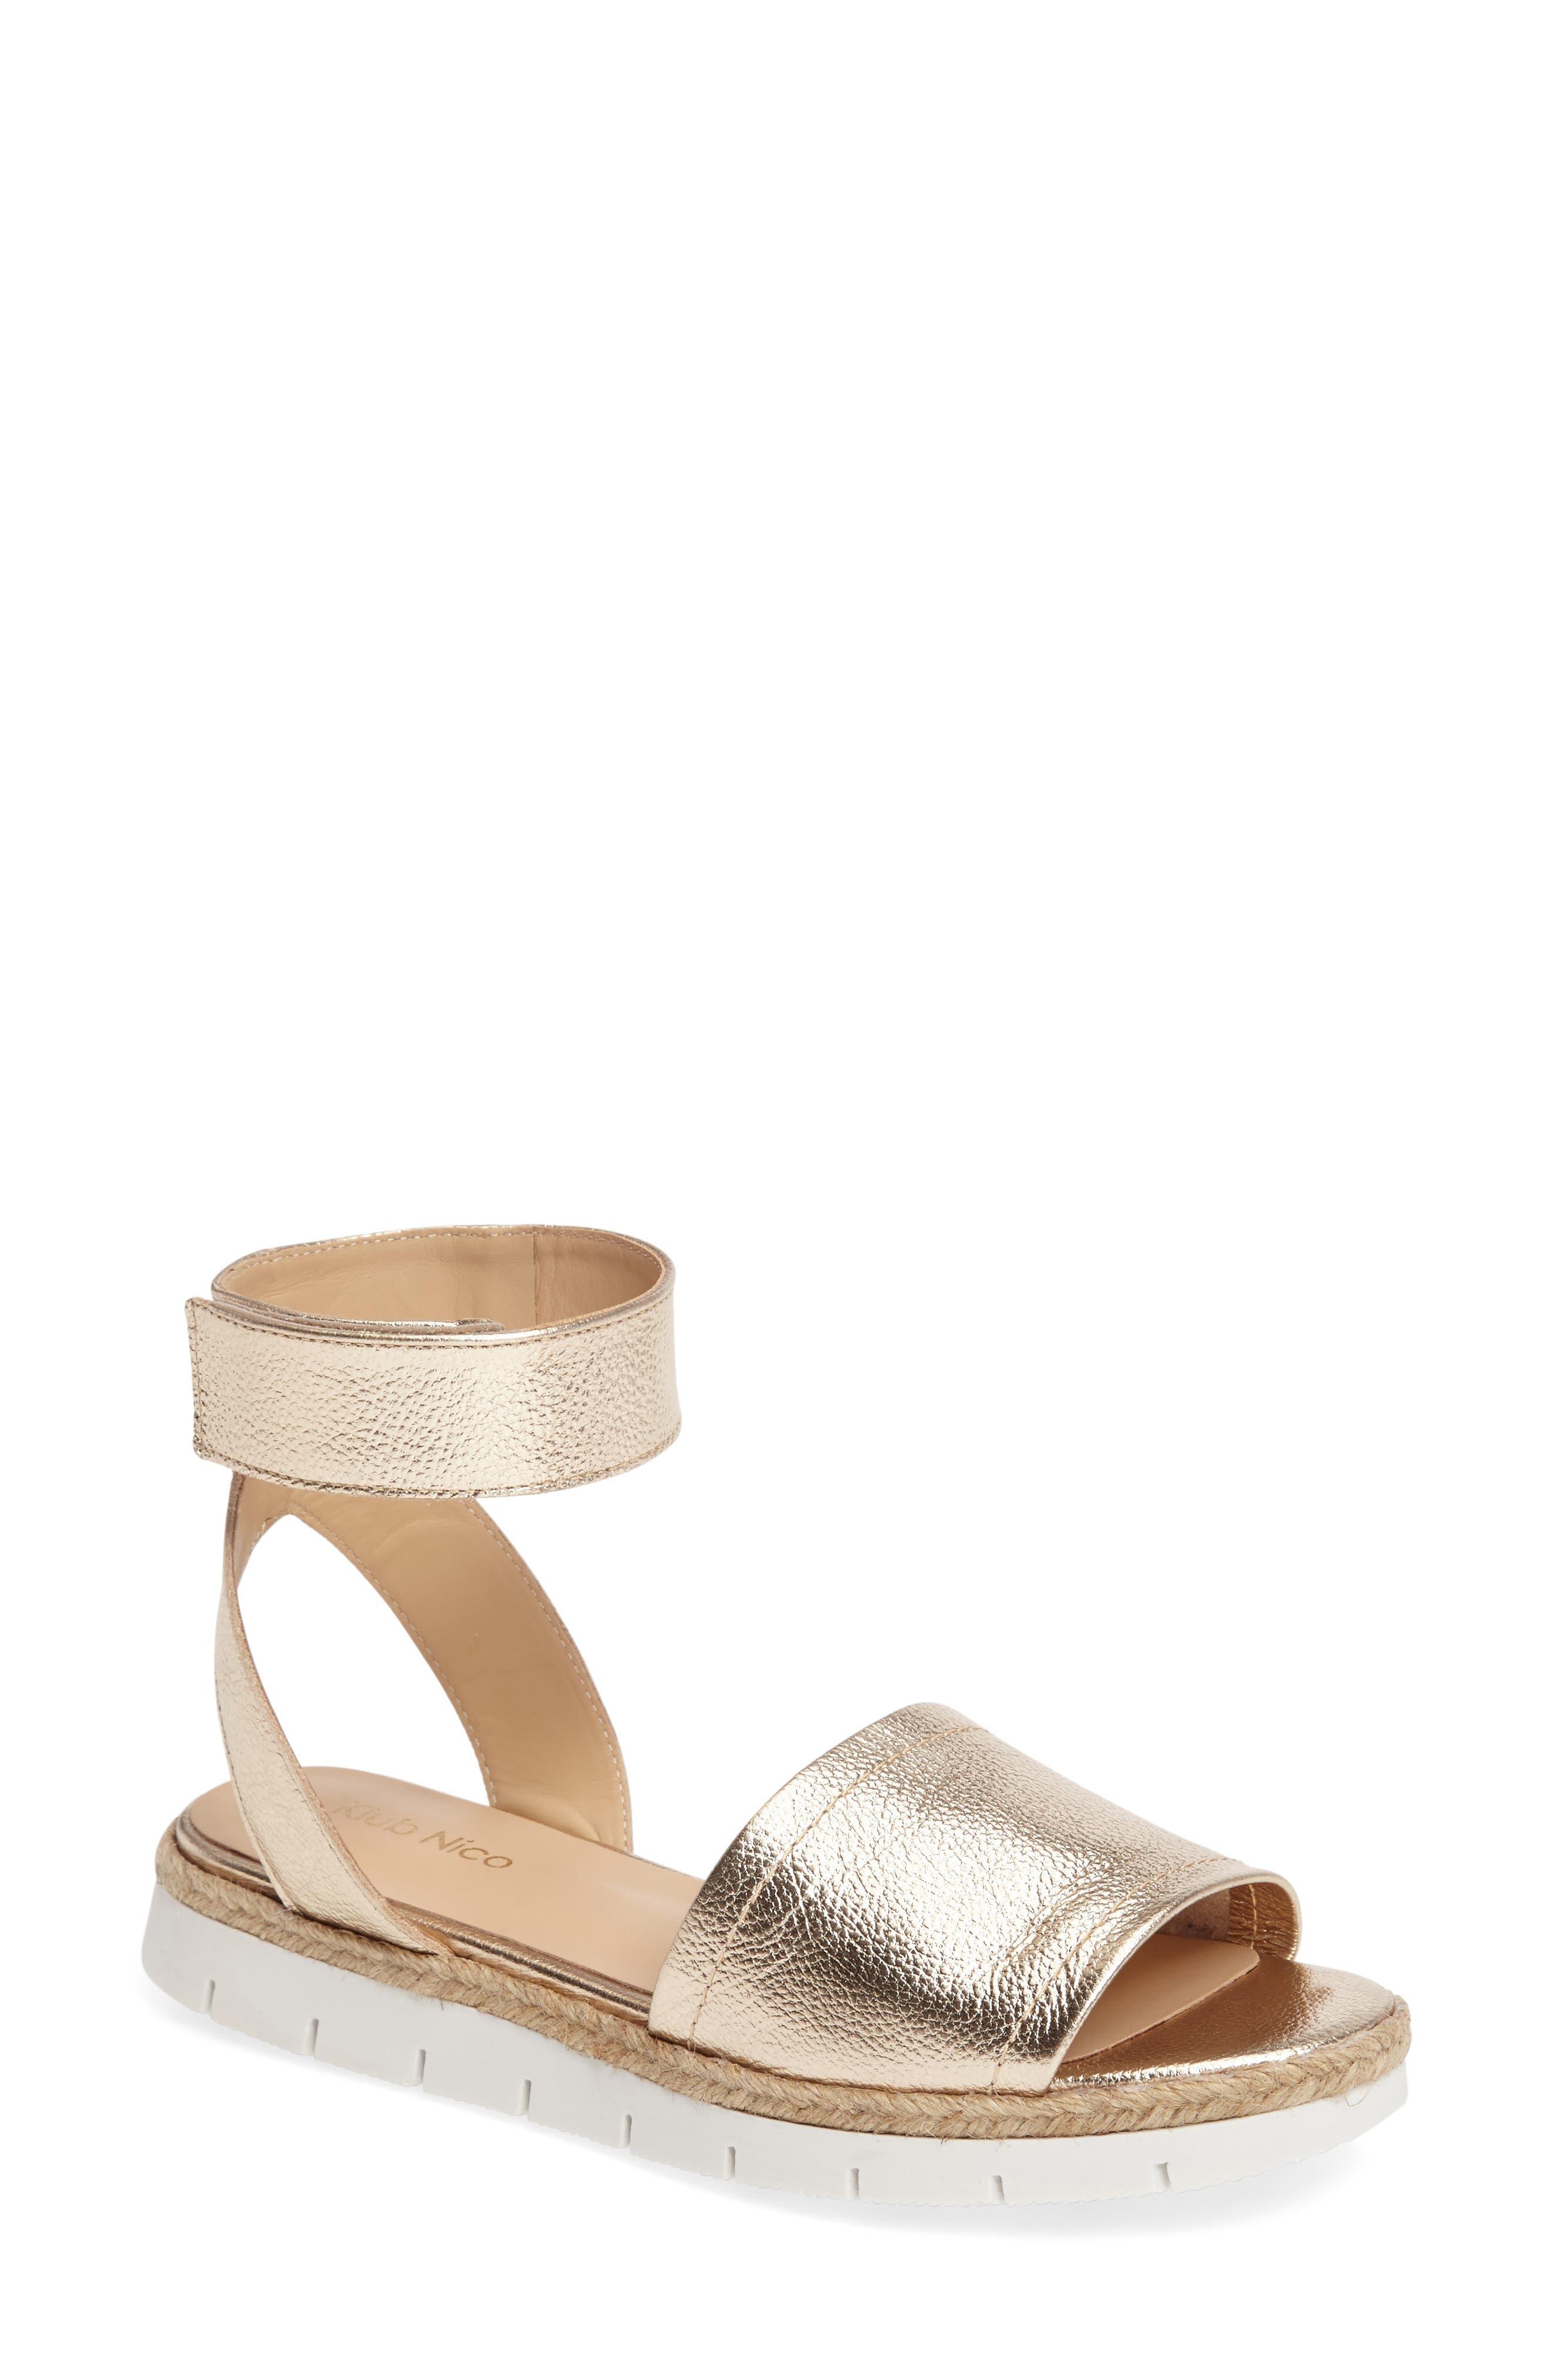 Cleo Platform Sandal,                             Main thumbnail 1, color,                             Champagne Leather